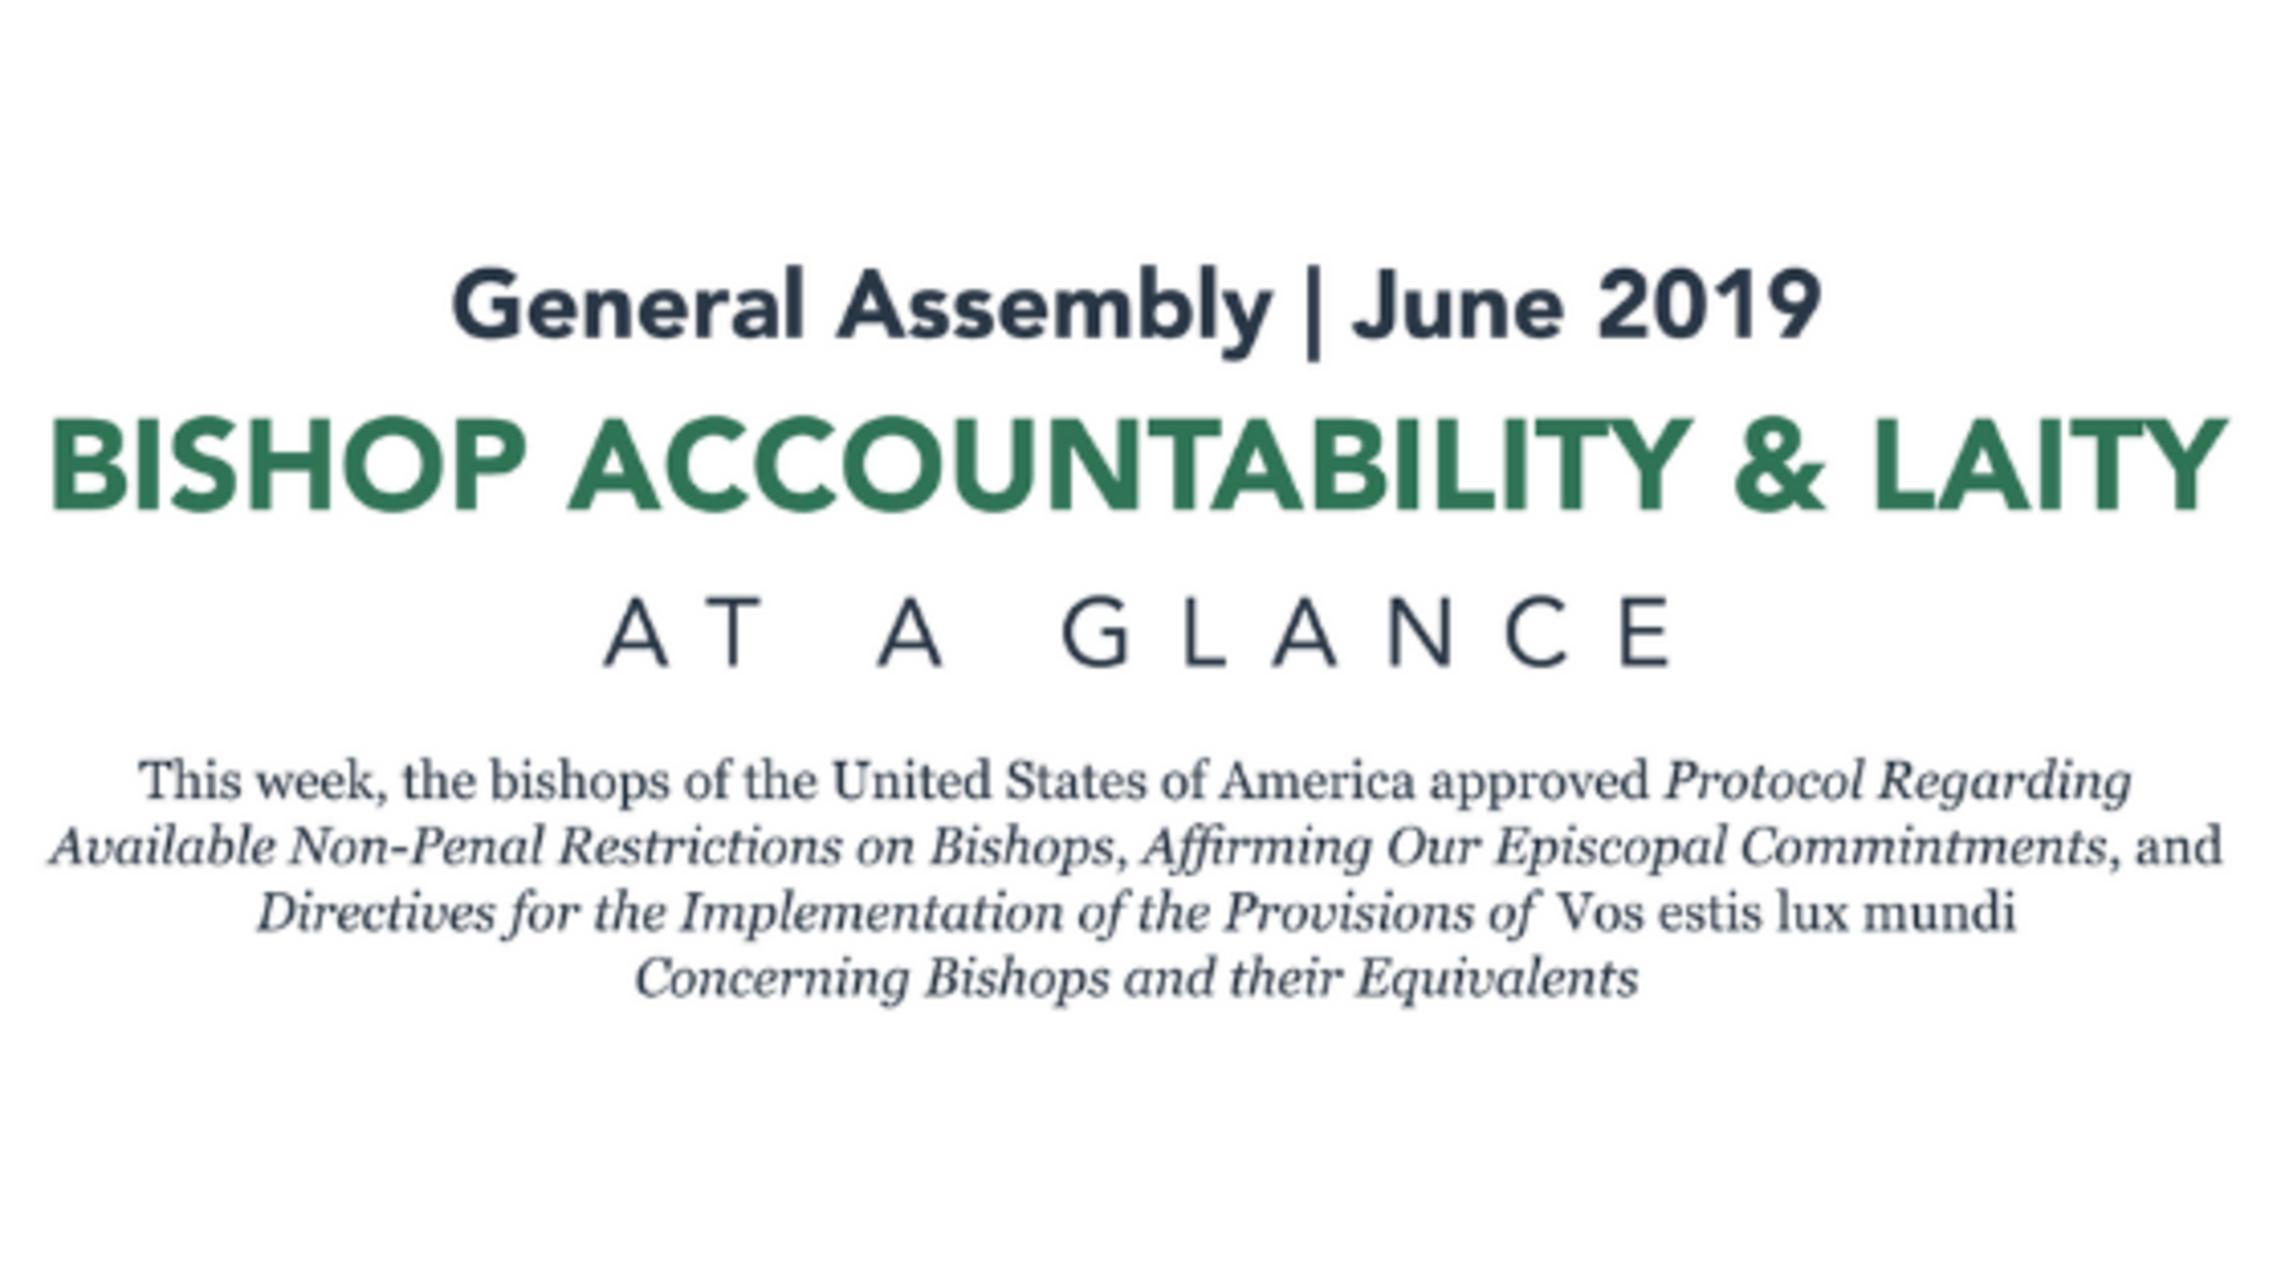 Bishop Accountability